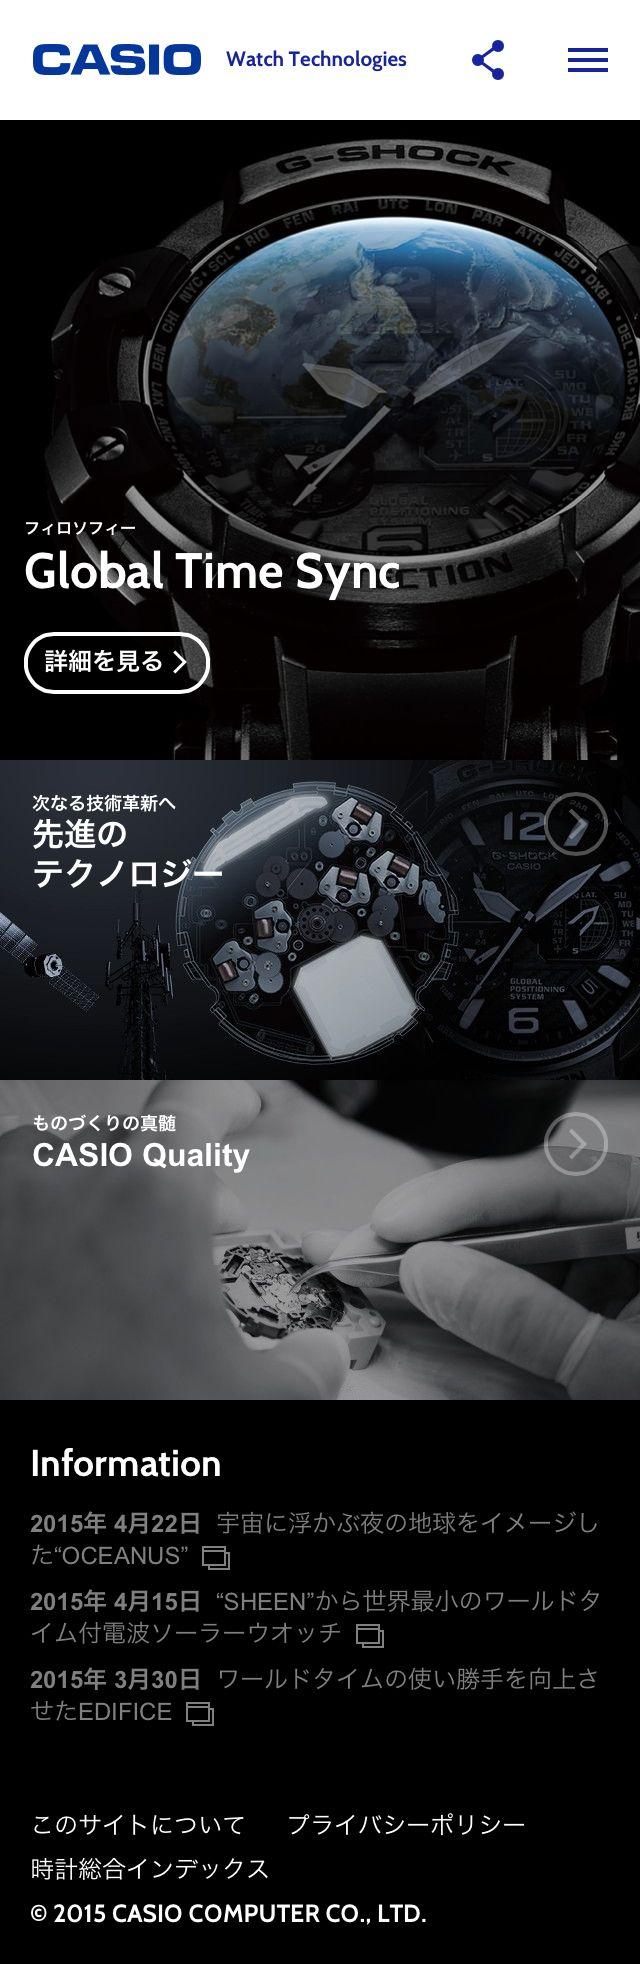 http://www.casio-watches.com/technology/ja/